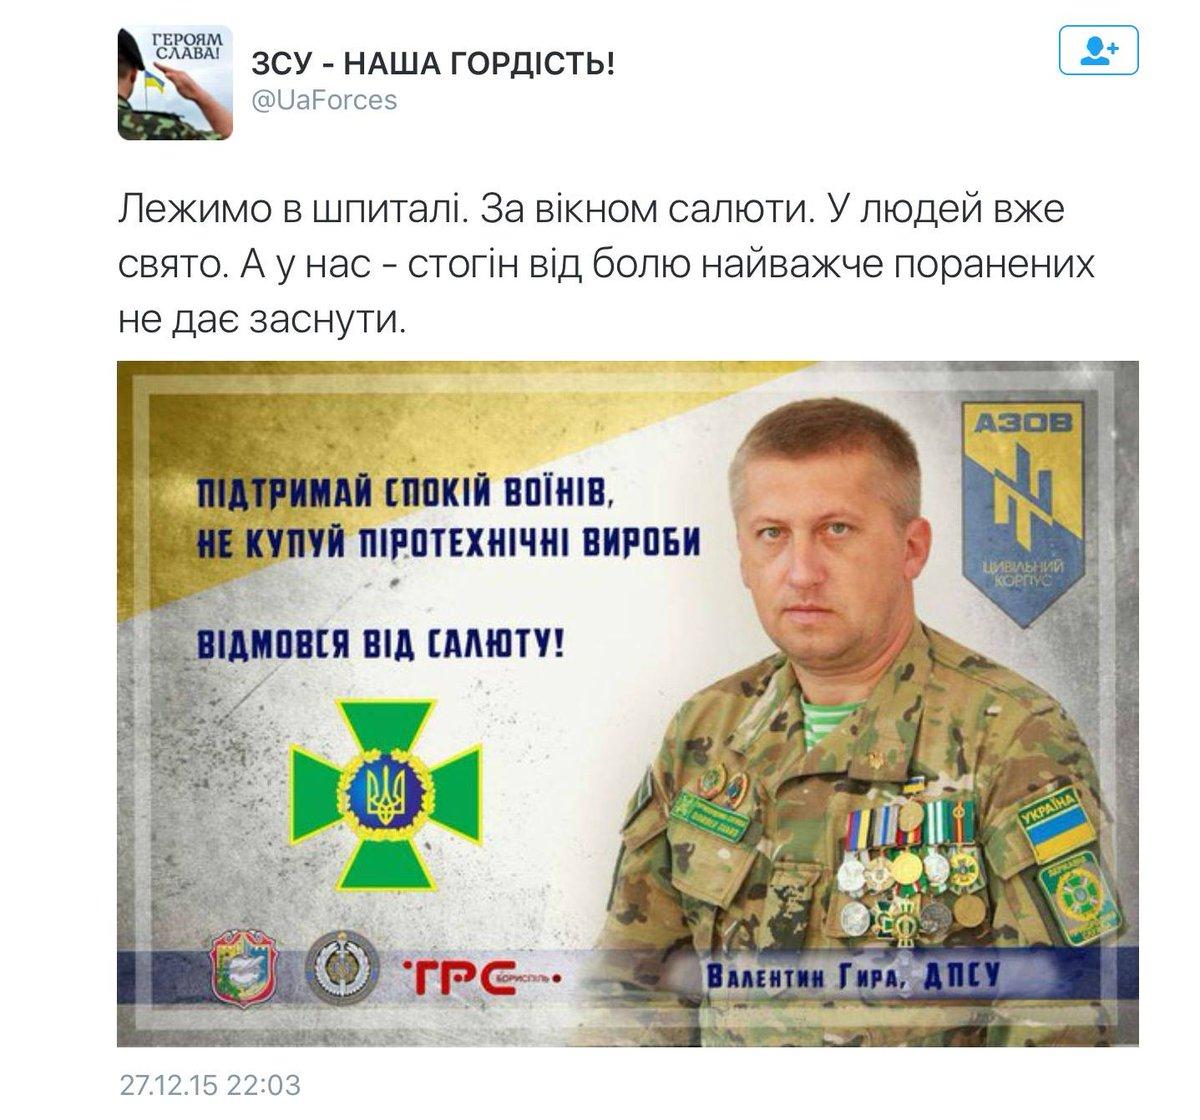 Тука запретил фейерверки на Луганщине - Цензор.НЕТ 5370